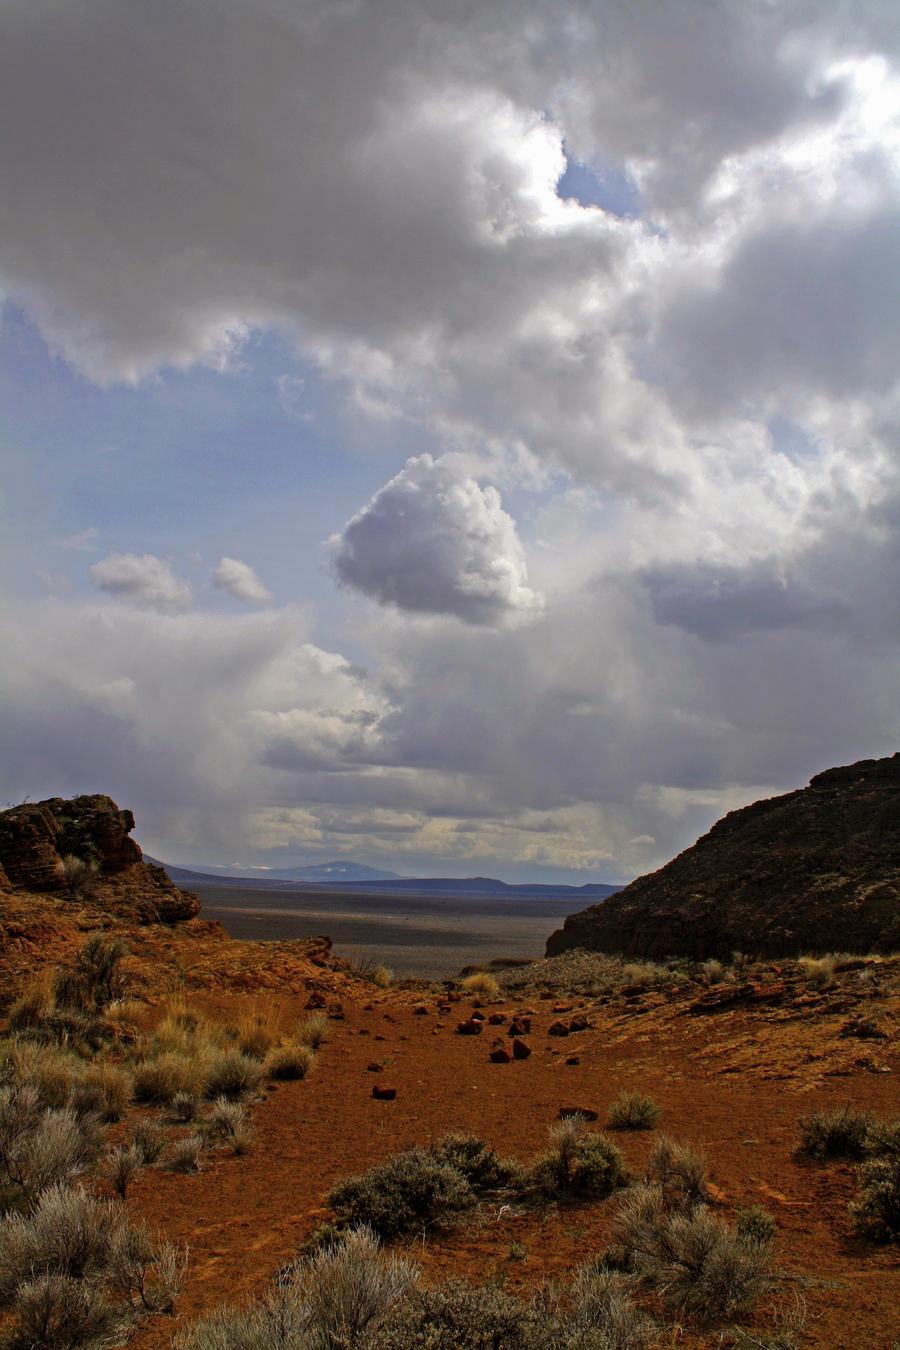 Thunder at the Rock by Thundercatt99